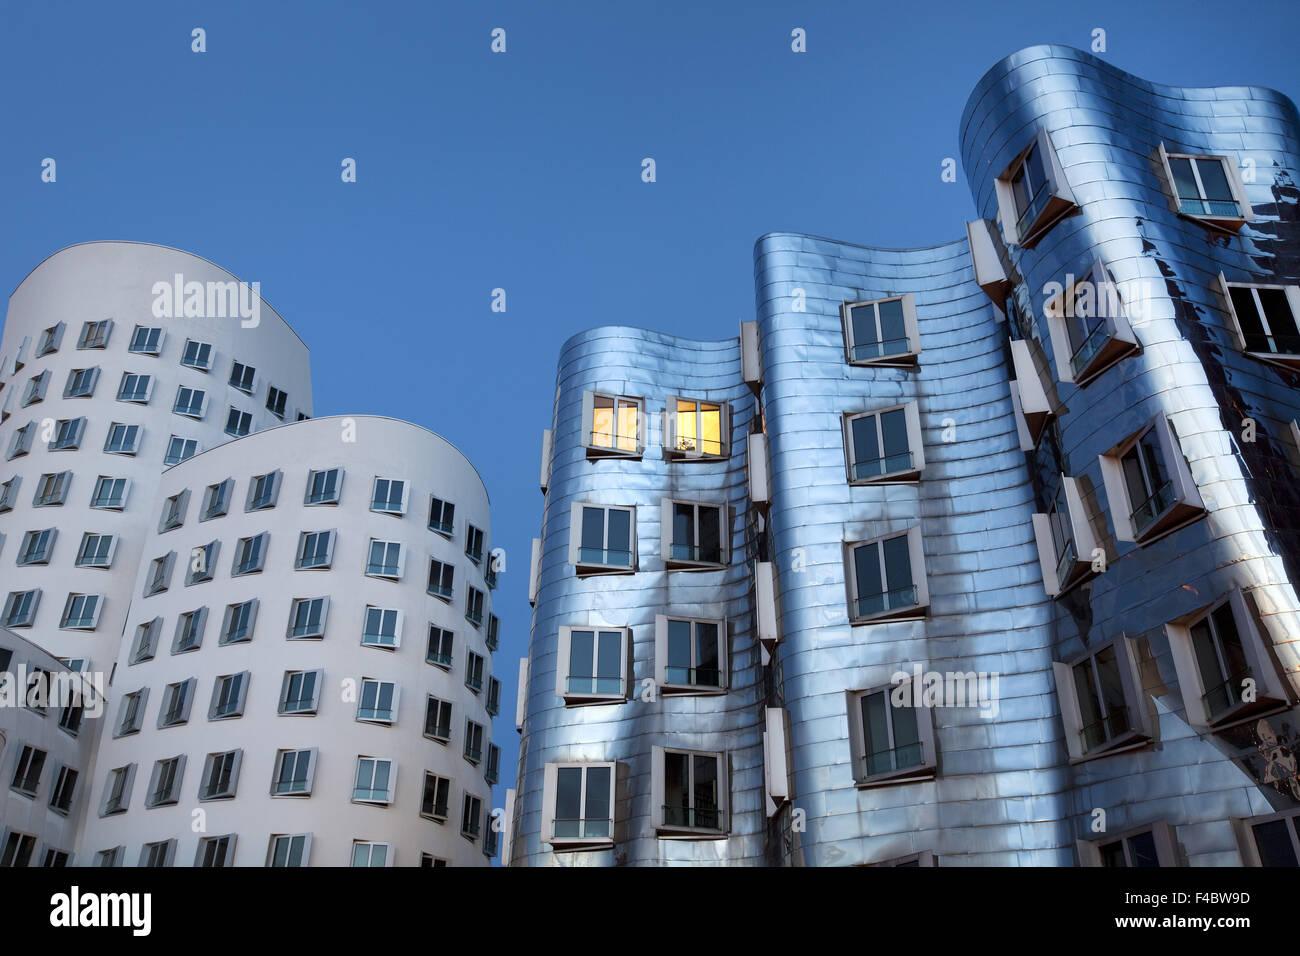 Gehry buildings, New Zollhof, Duesseldorf - Stock Image